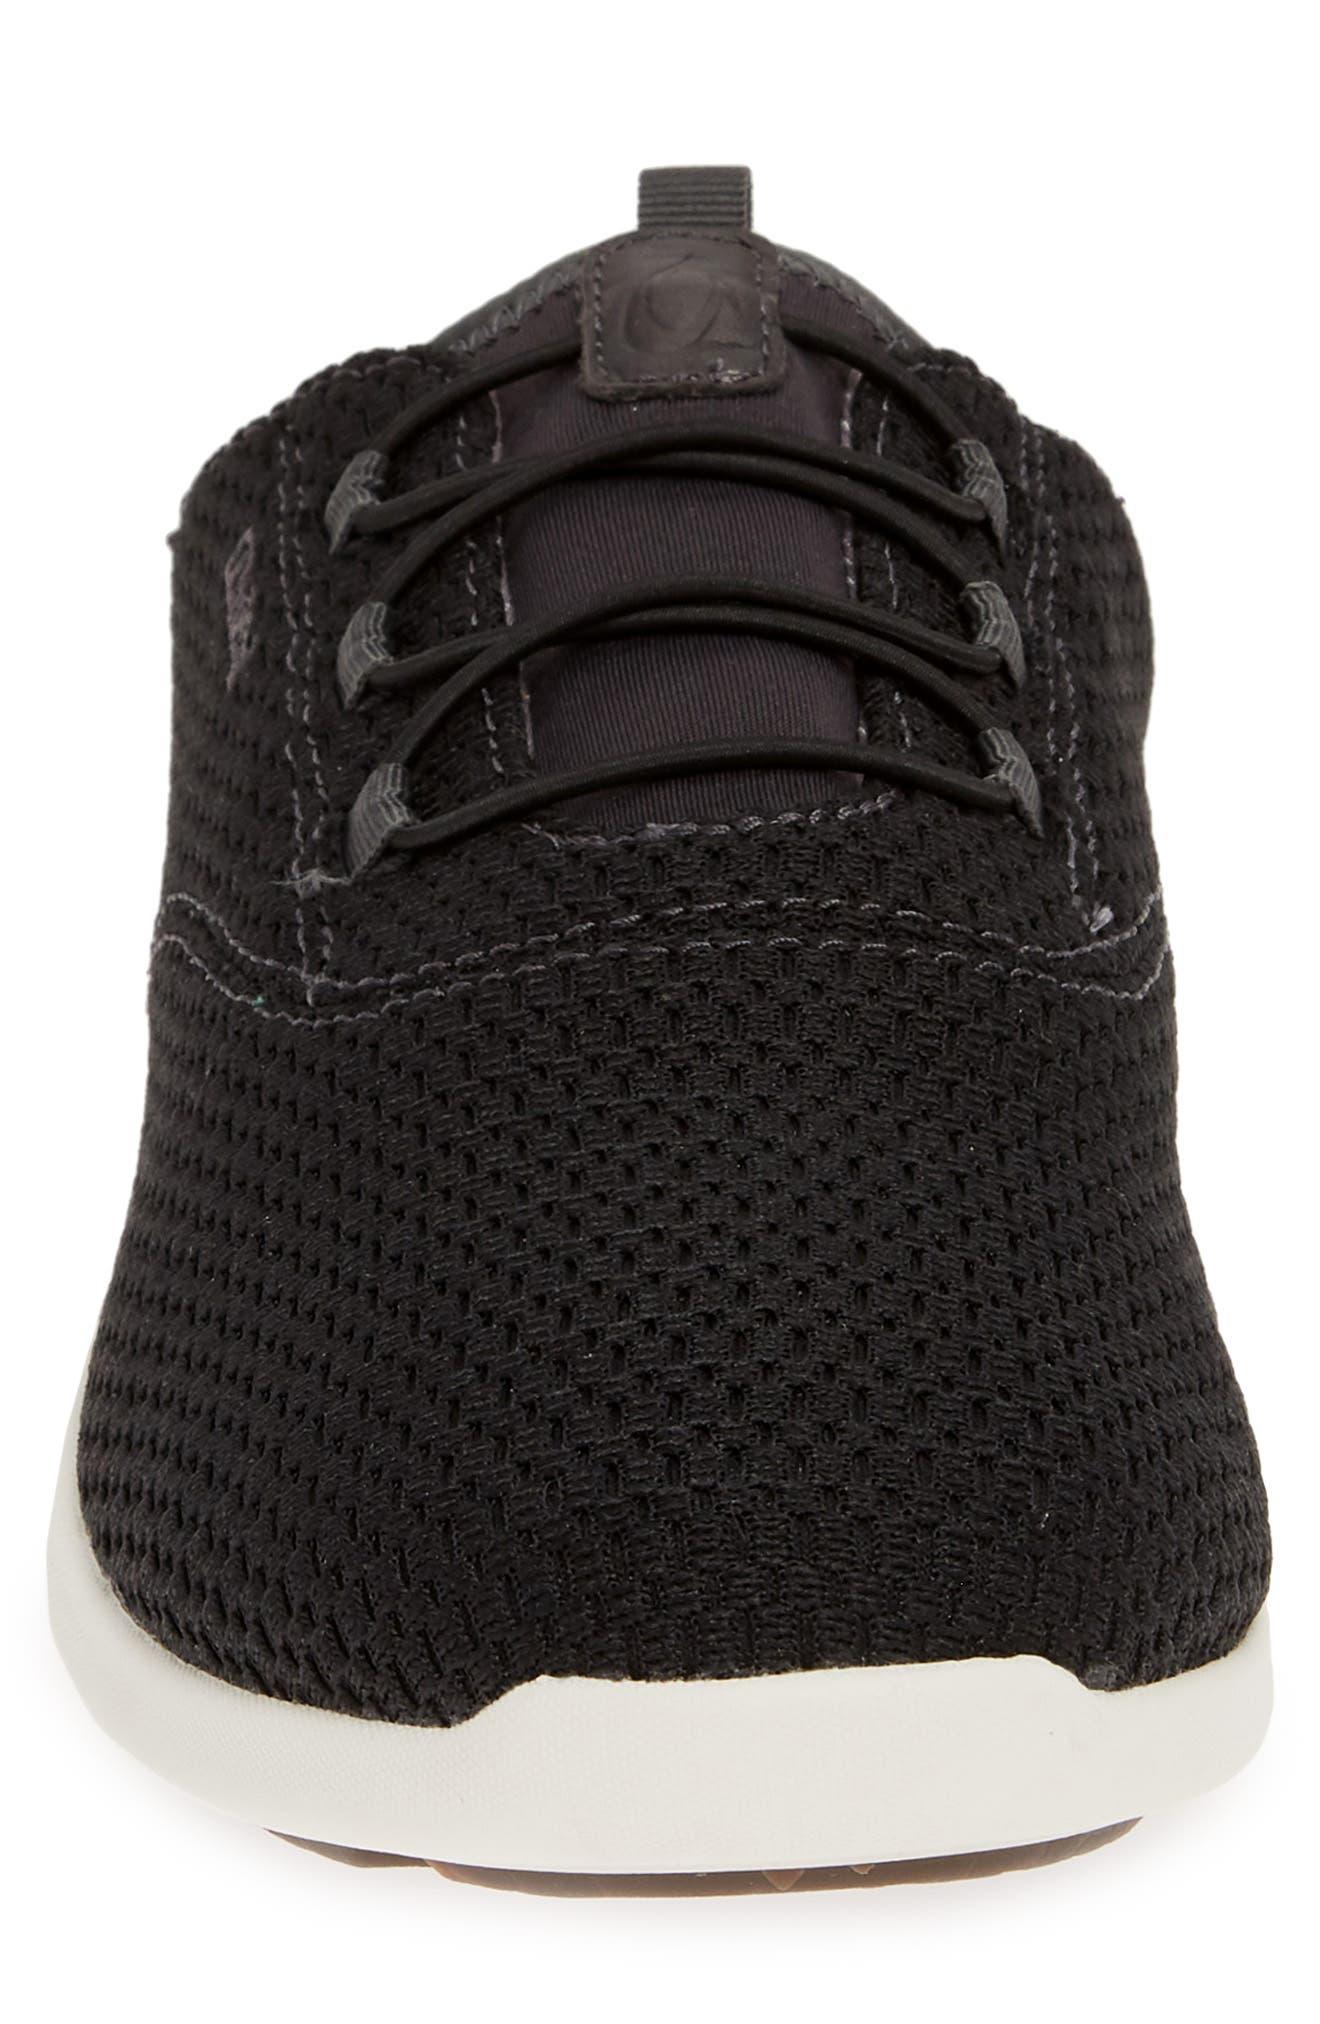 OLUKAI, Alapa Li Sneaker, Alternate thumbnail 5, color, BLACK/ DARK SHADOW MESH